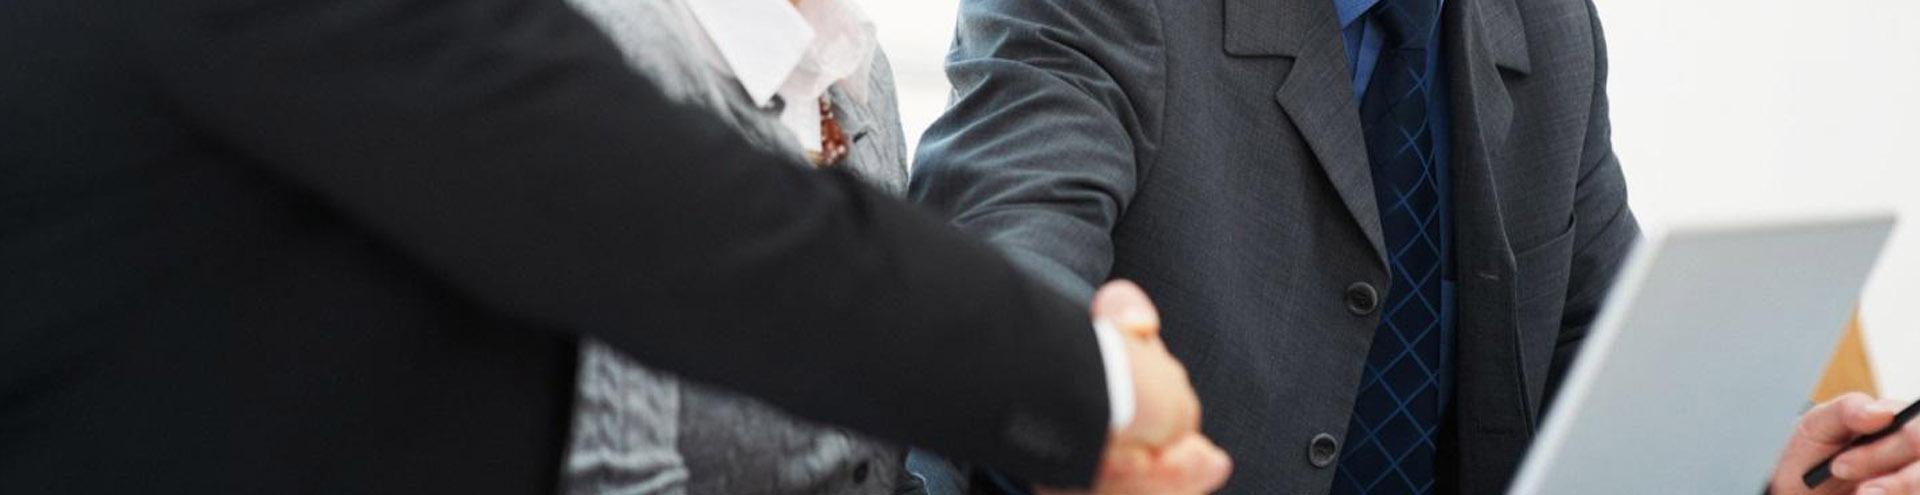 консультация юриста в Самаре